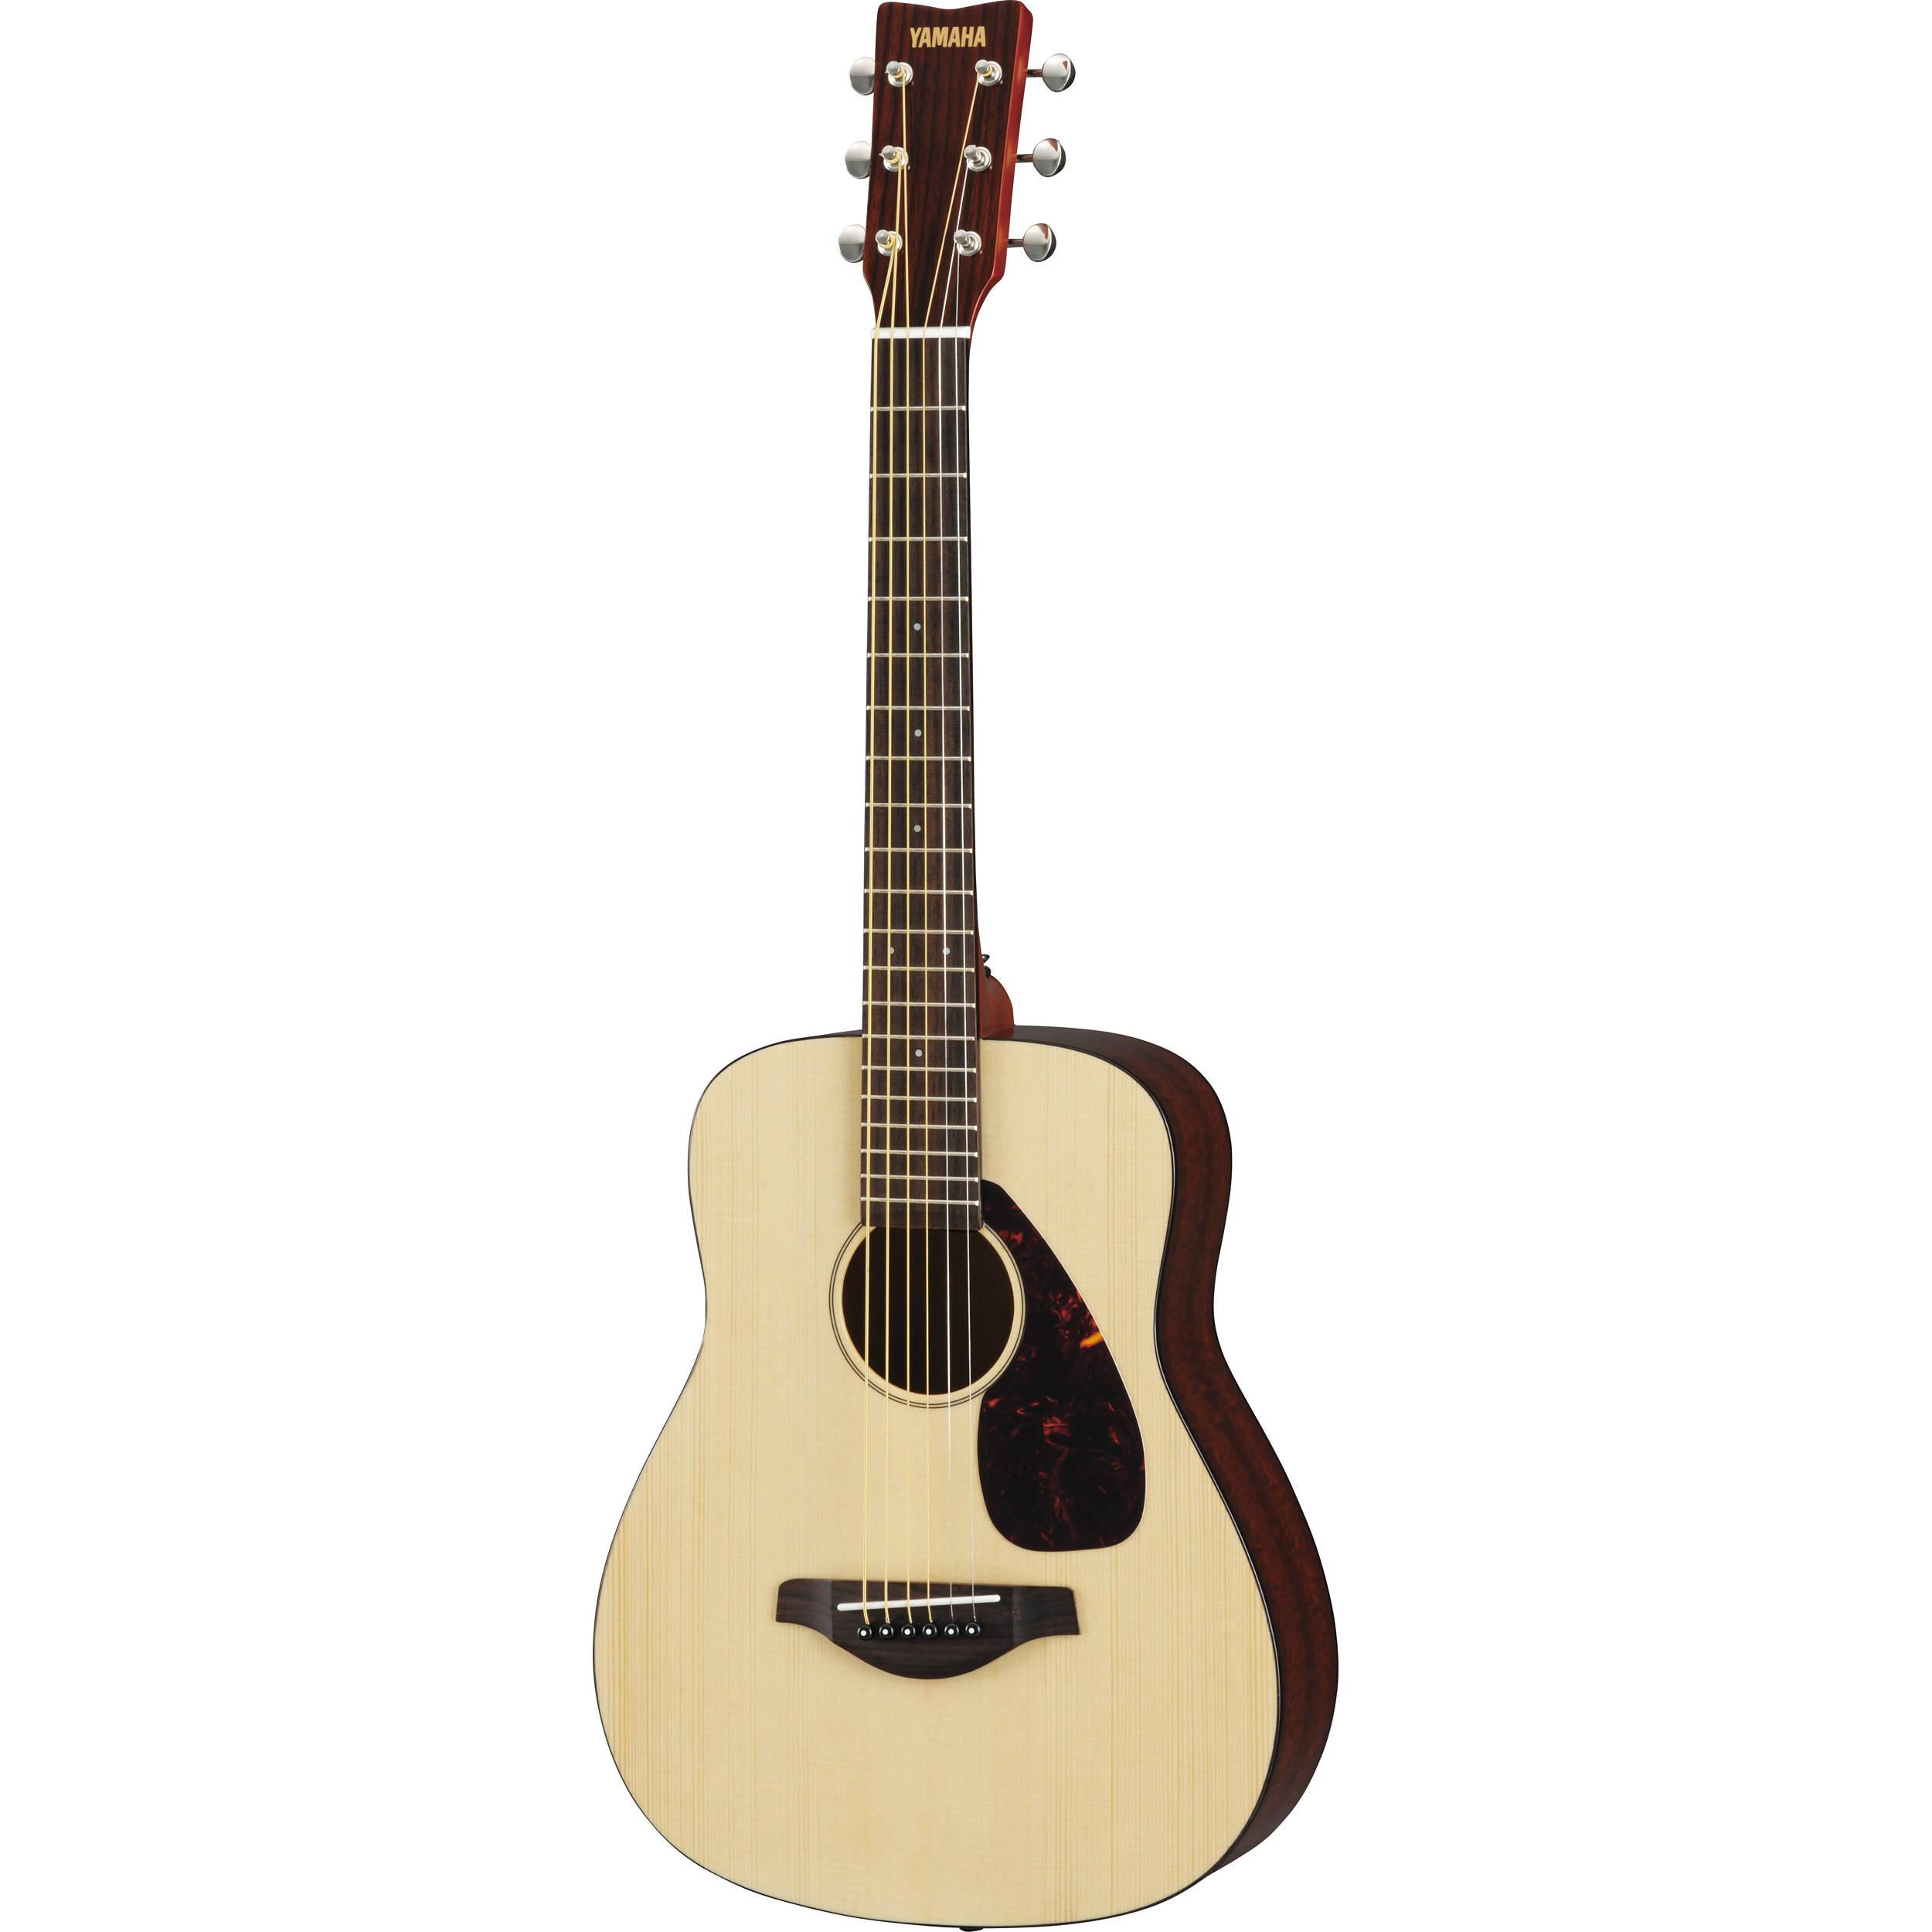 Yamaha jr2s solid top 3 4 size acoustic guitar natural jr2s for Yamaha solid top